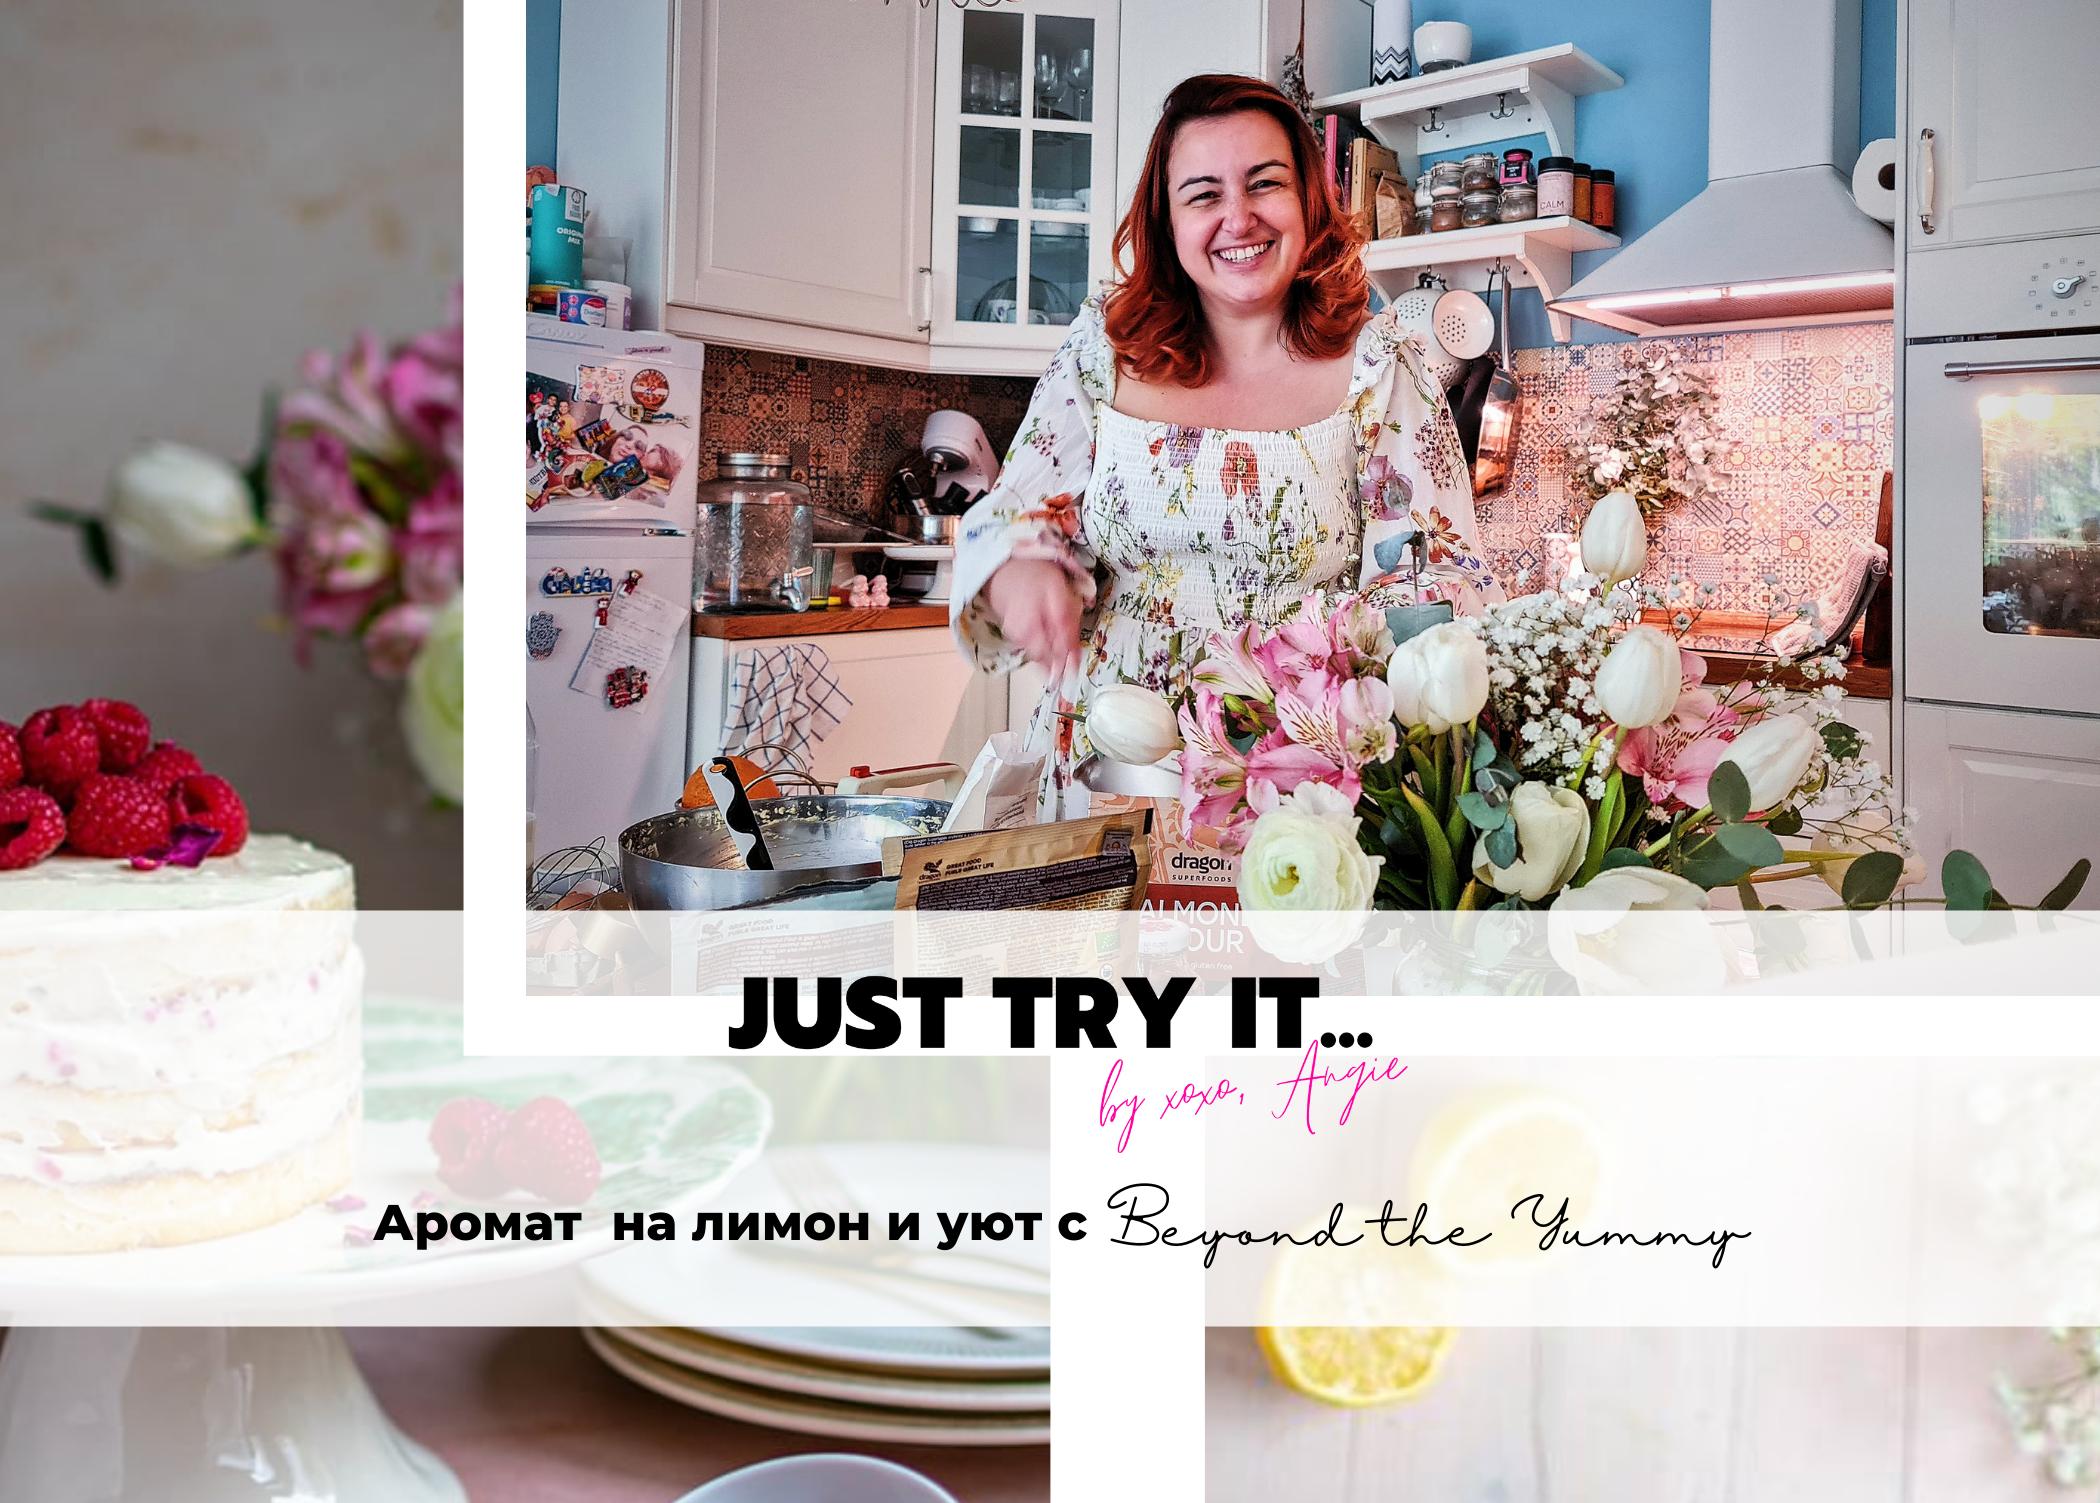 Just Try It … Aромат на лимон и уют с Beyond the Yummy